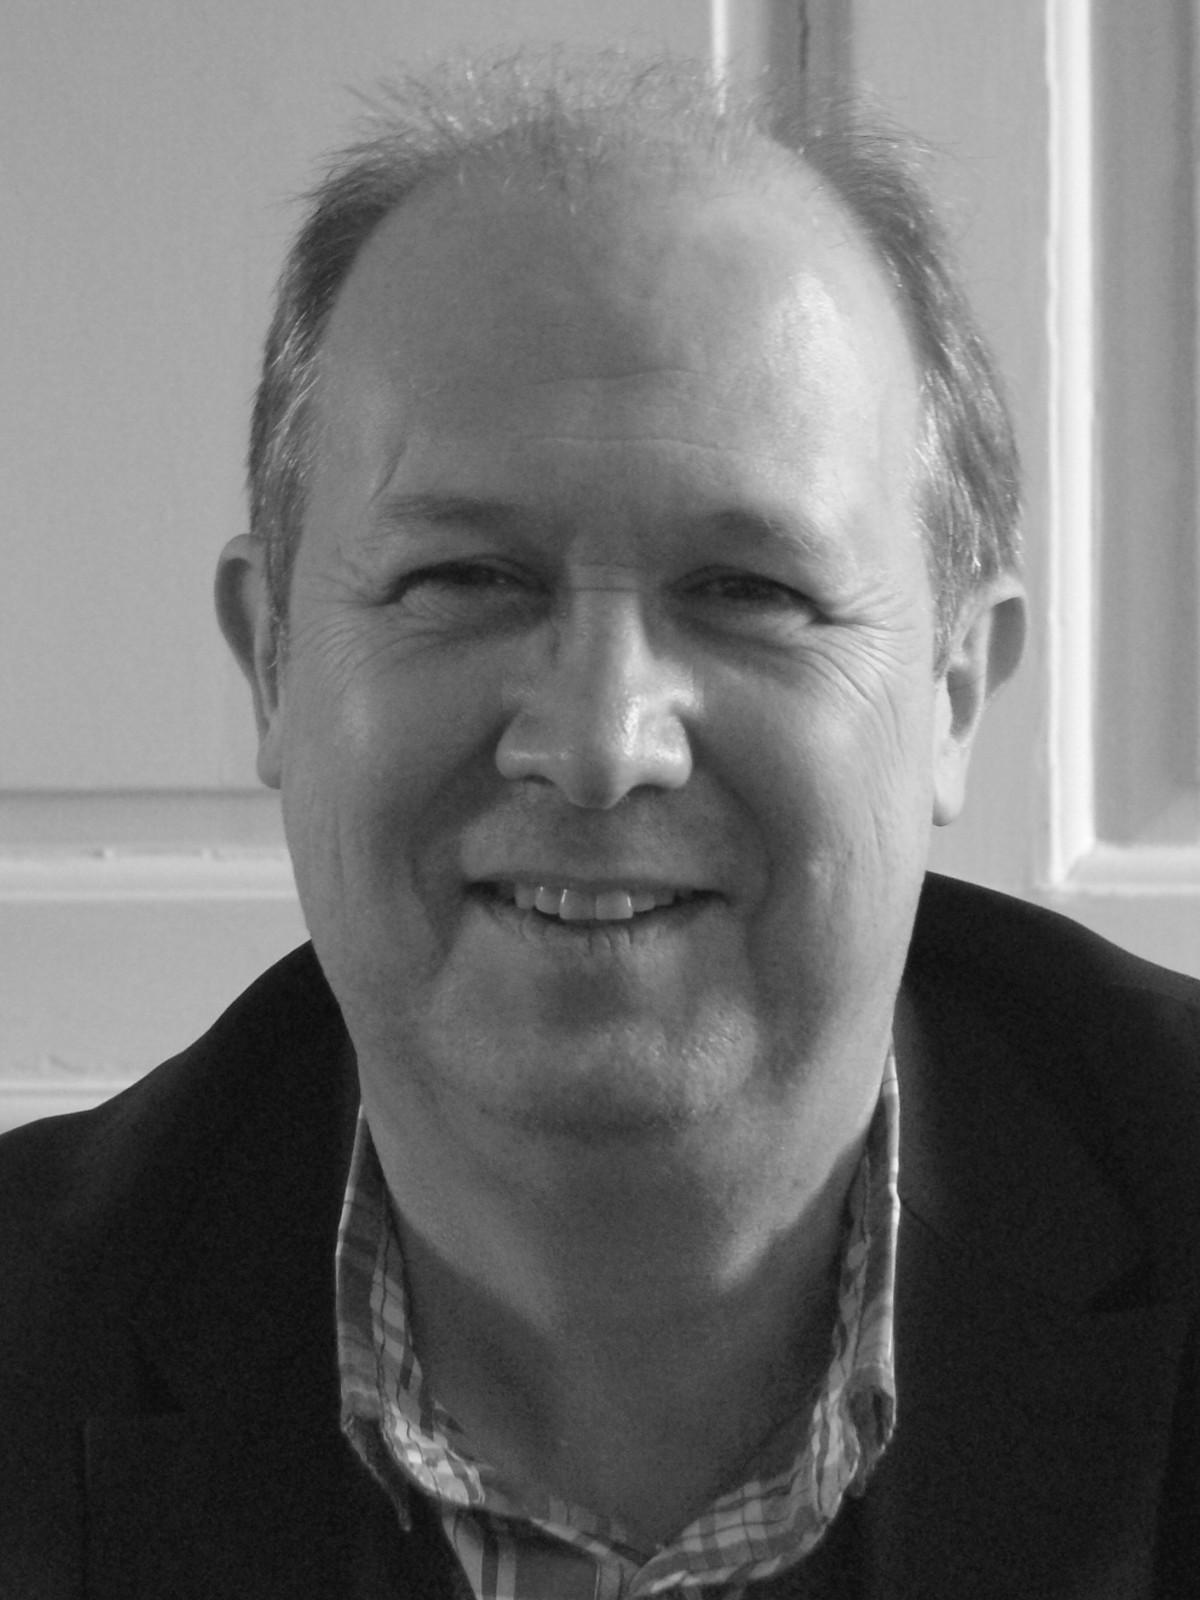 James Woodall